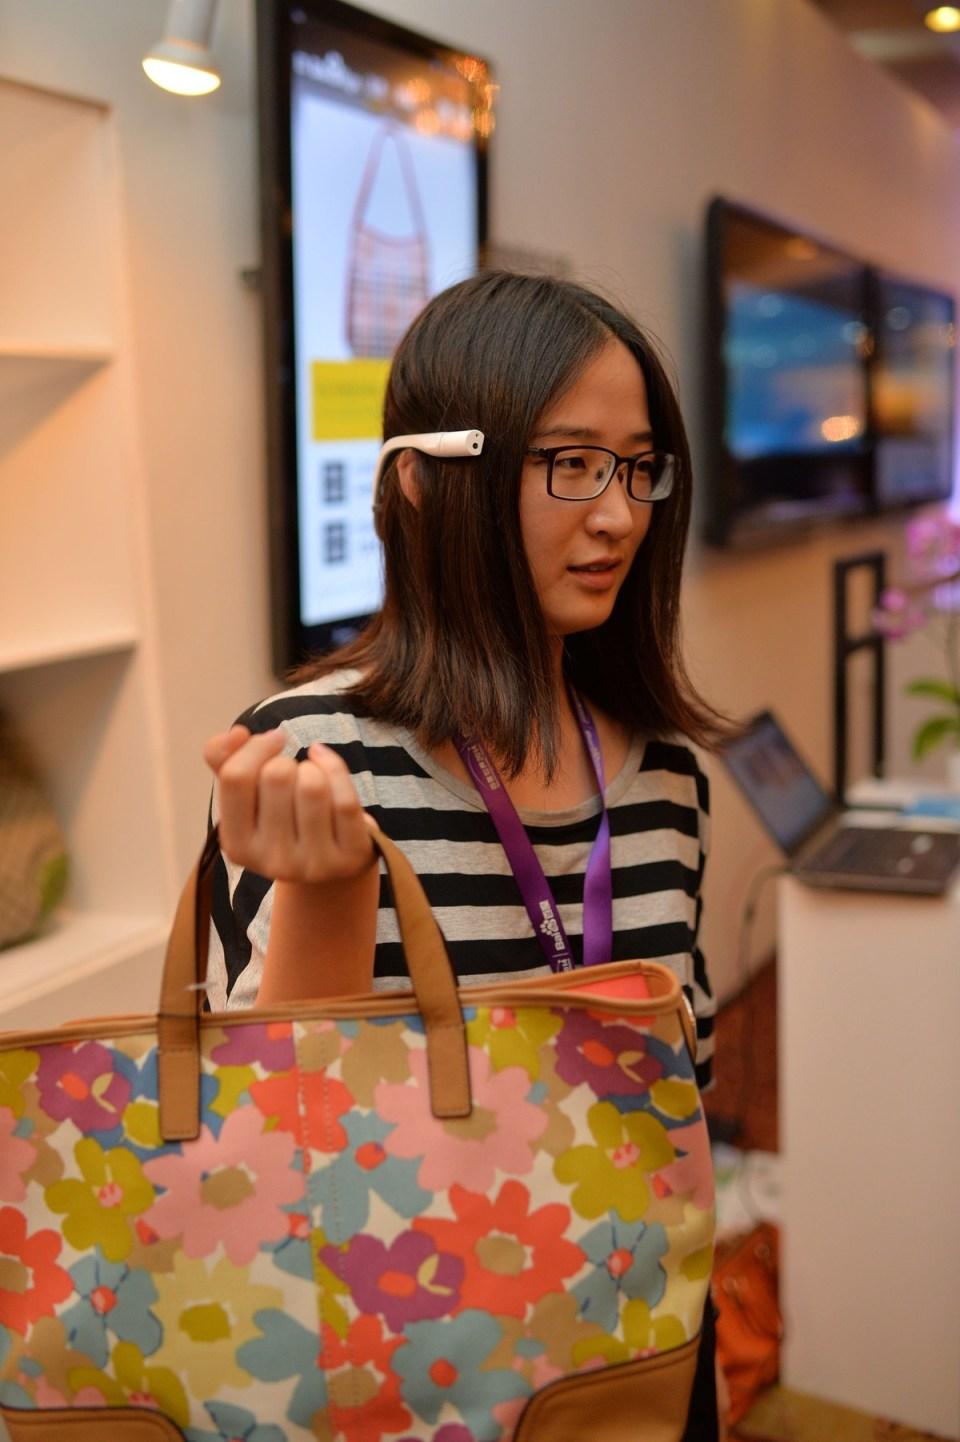 Chinese Reply To Google Glass - Baidu Eye